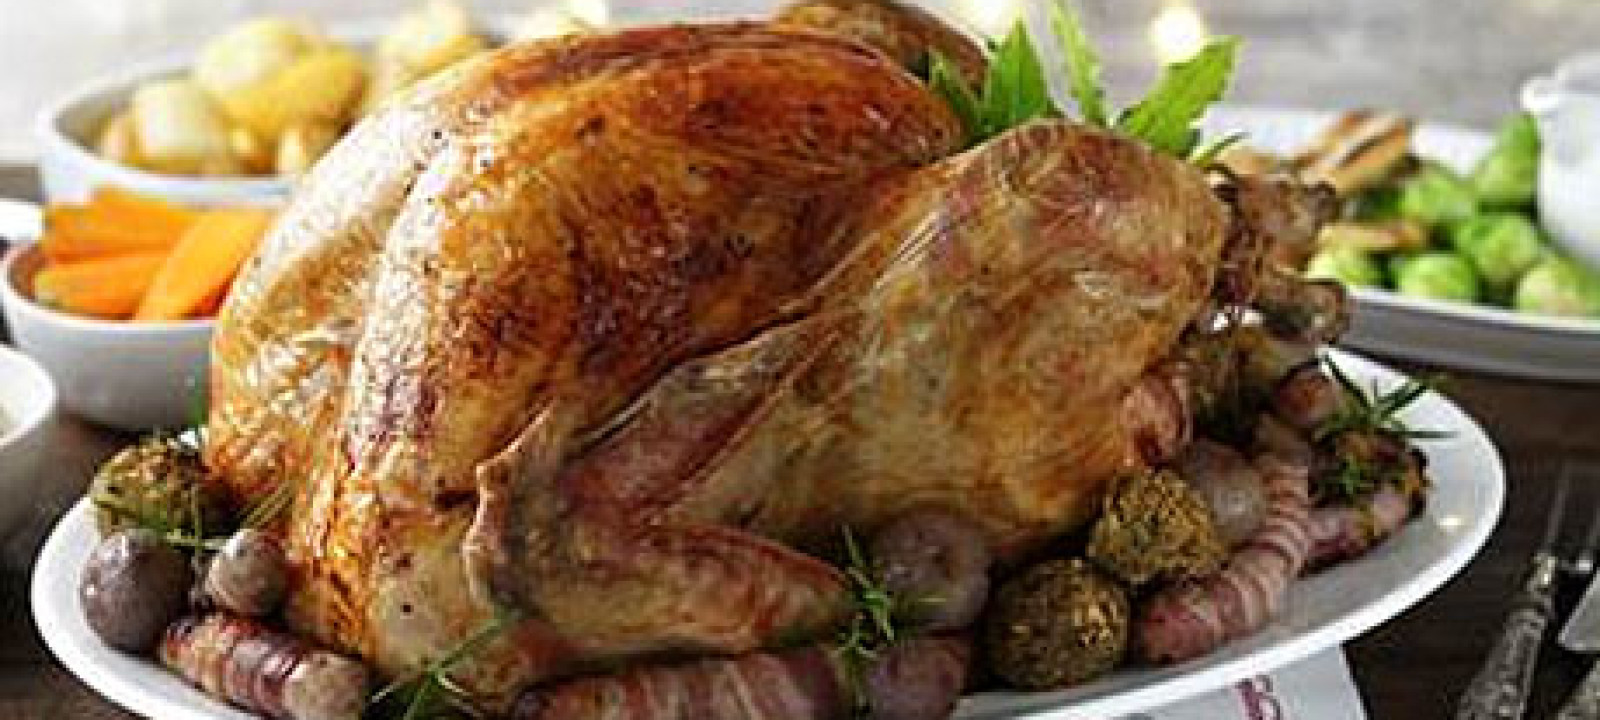 England Christmas Dinner.Anatomy Of A British Christmas Dinner Anglophenia Bbc